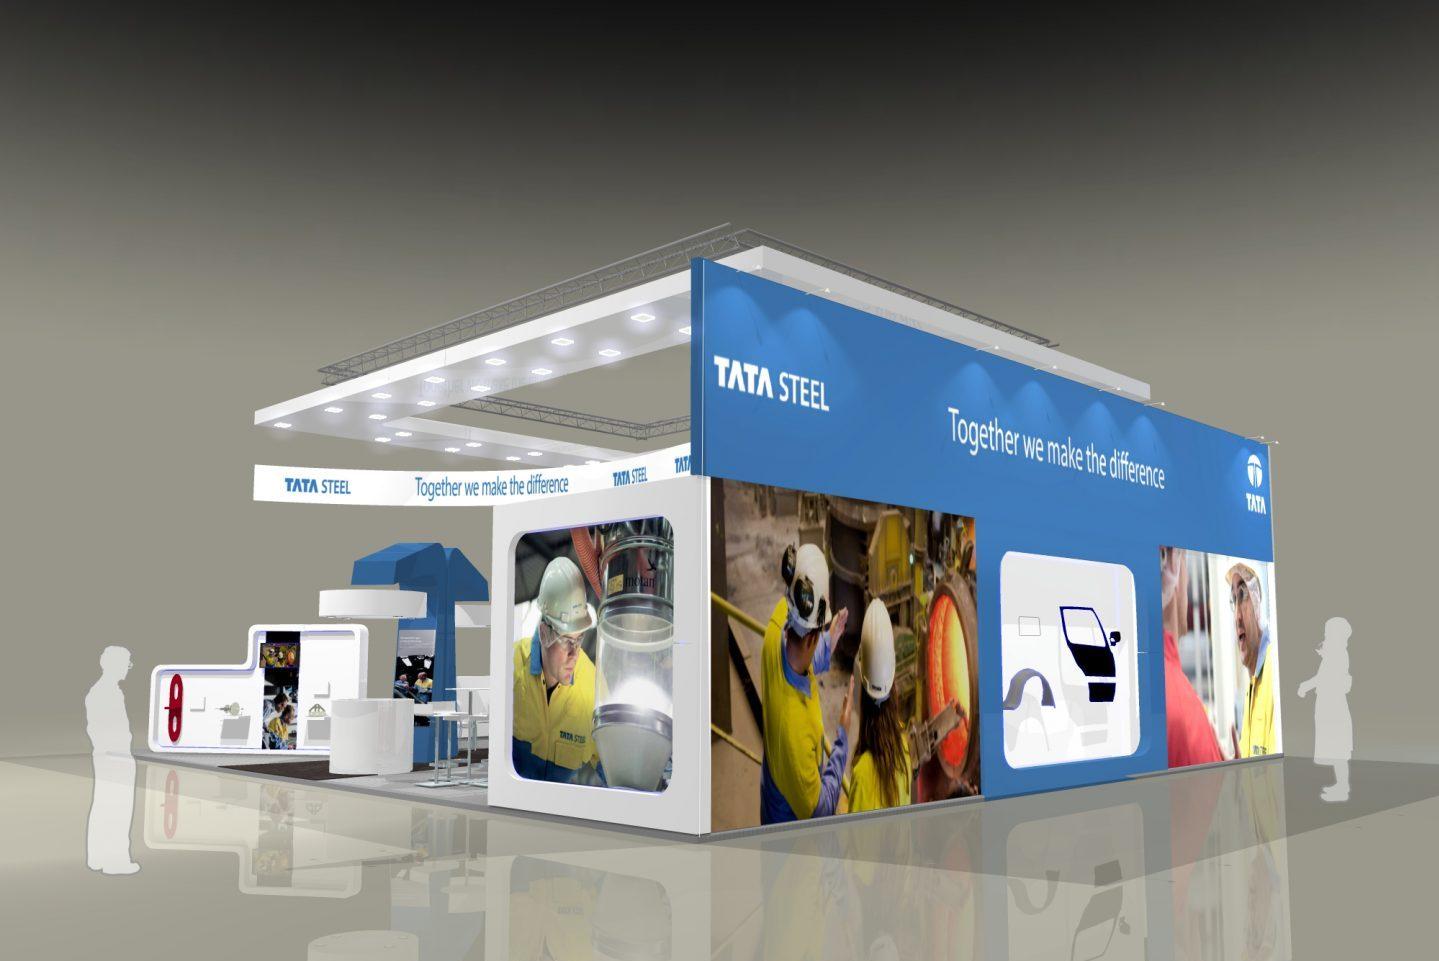 Exhibition Display Design & Installation - Tata Steel